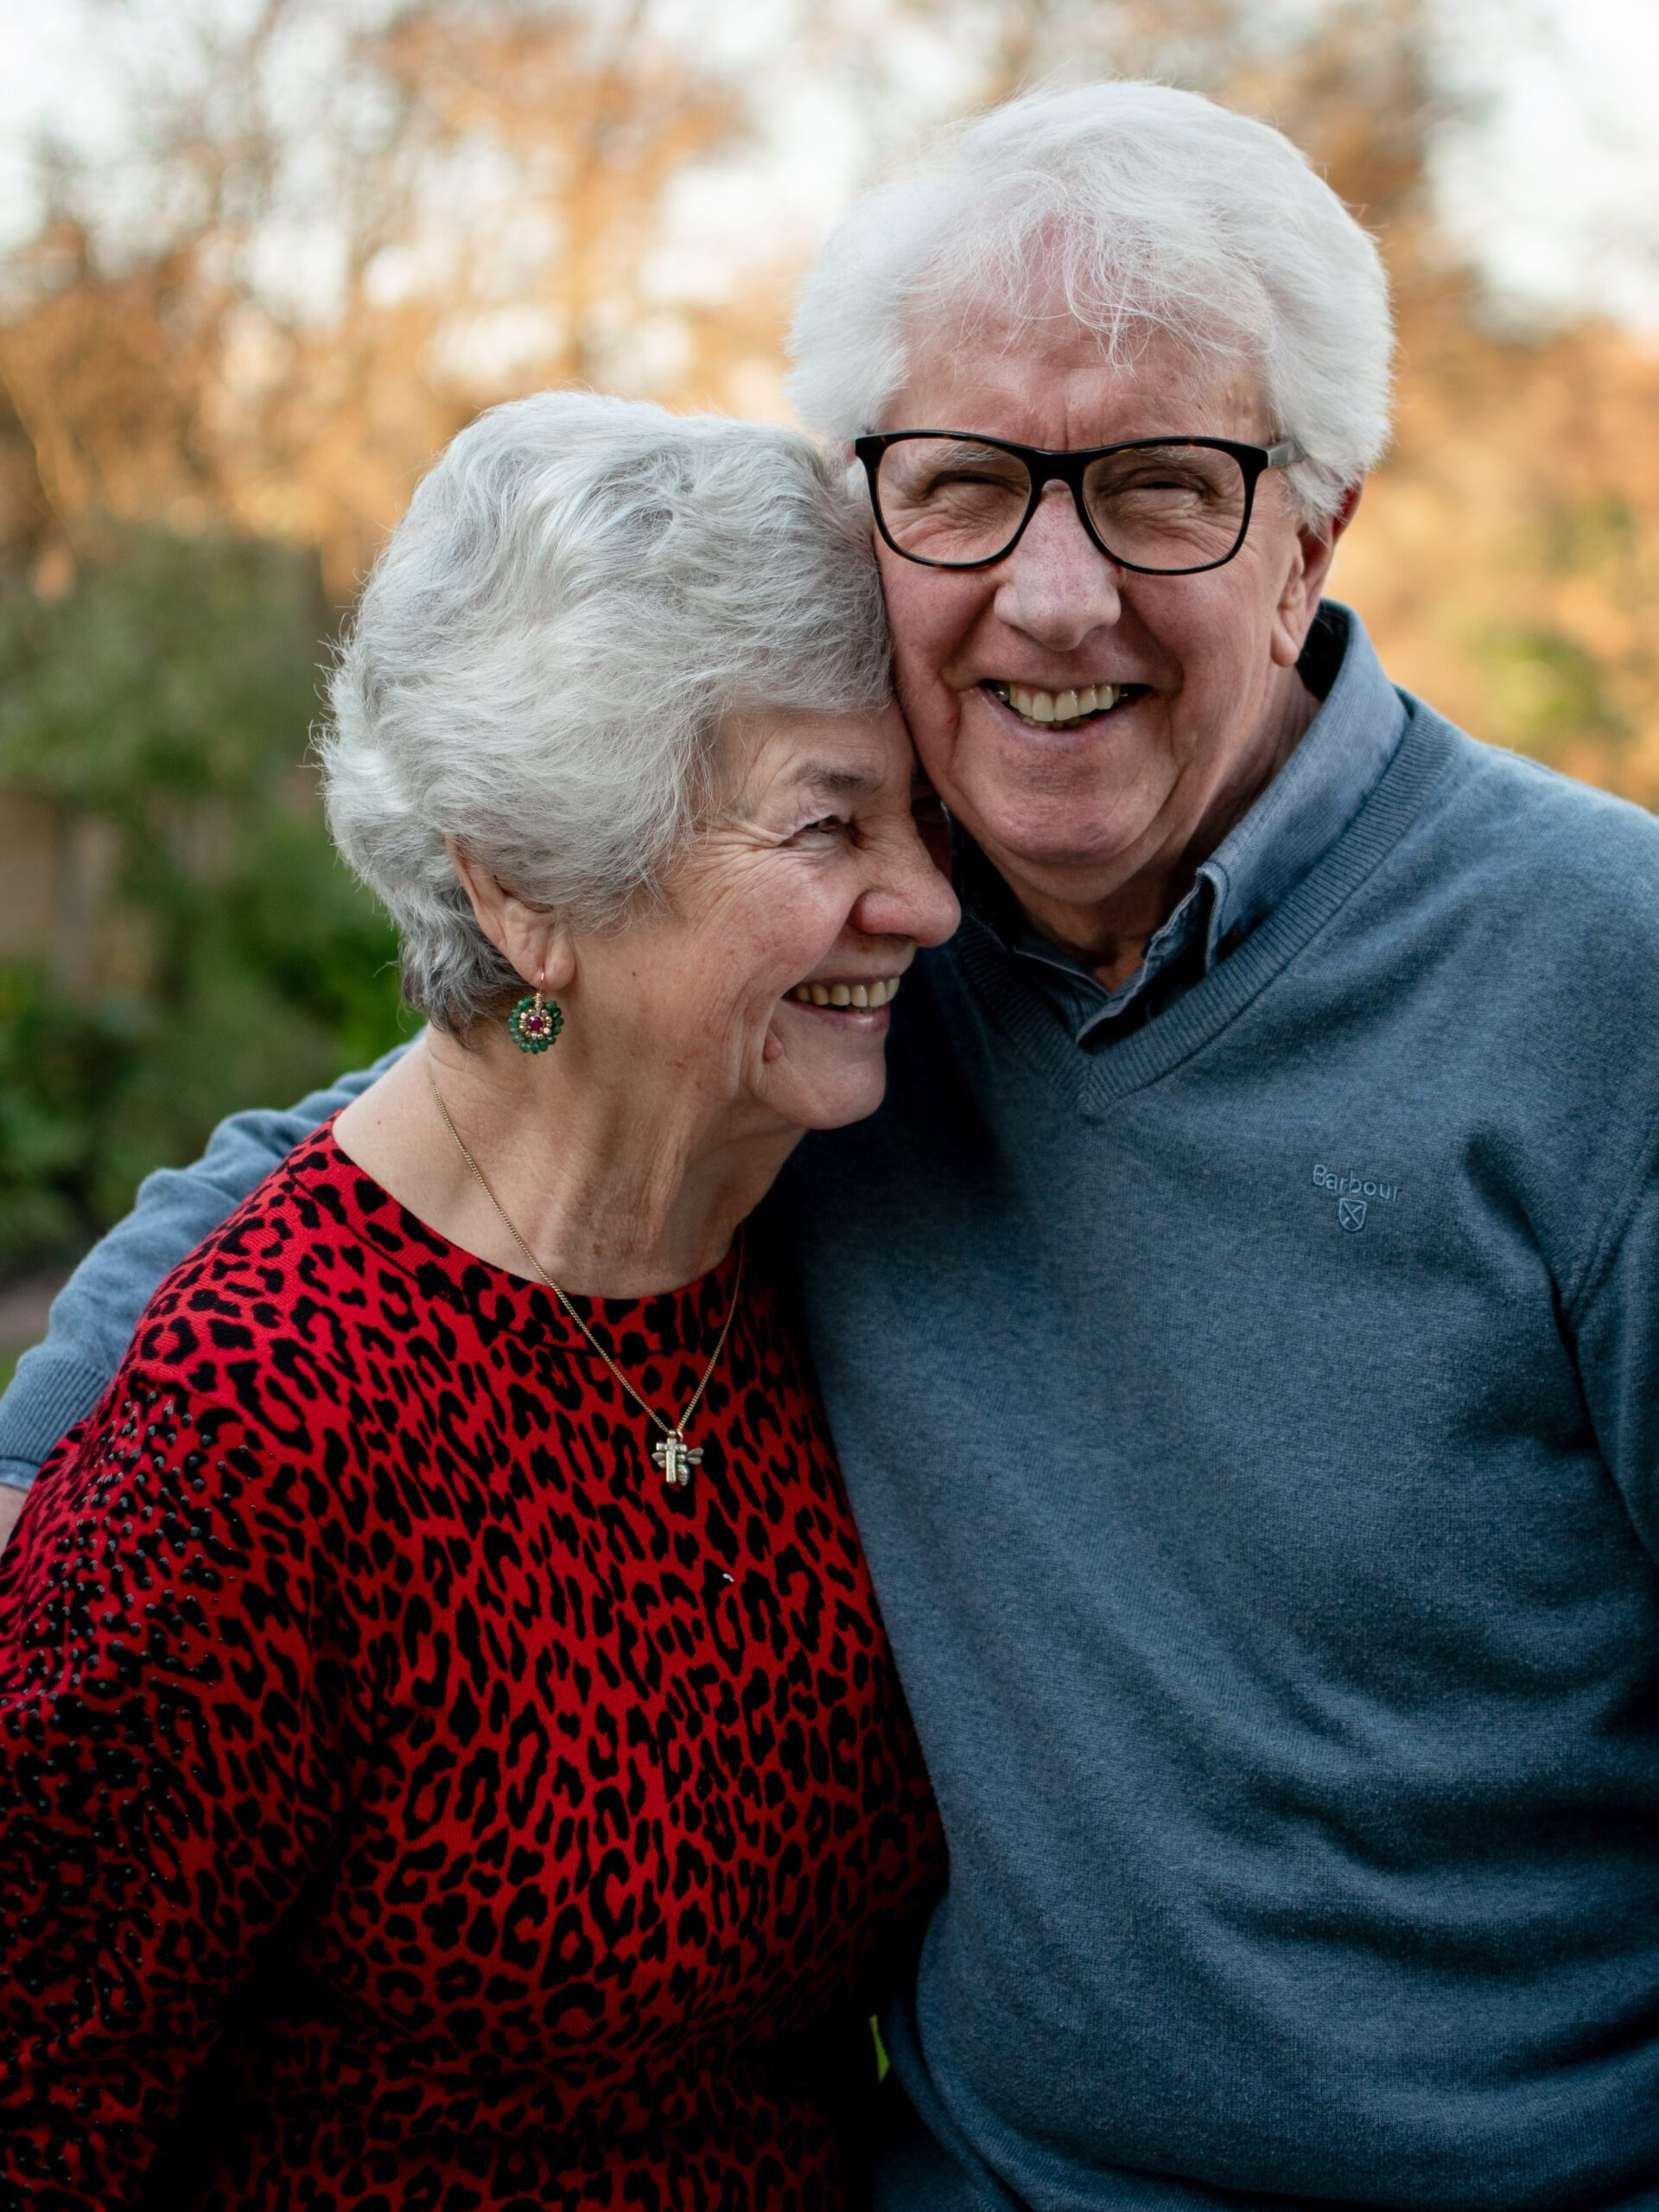 joe-hepburn-older couple embrace-unsplash